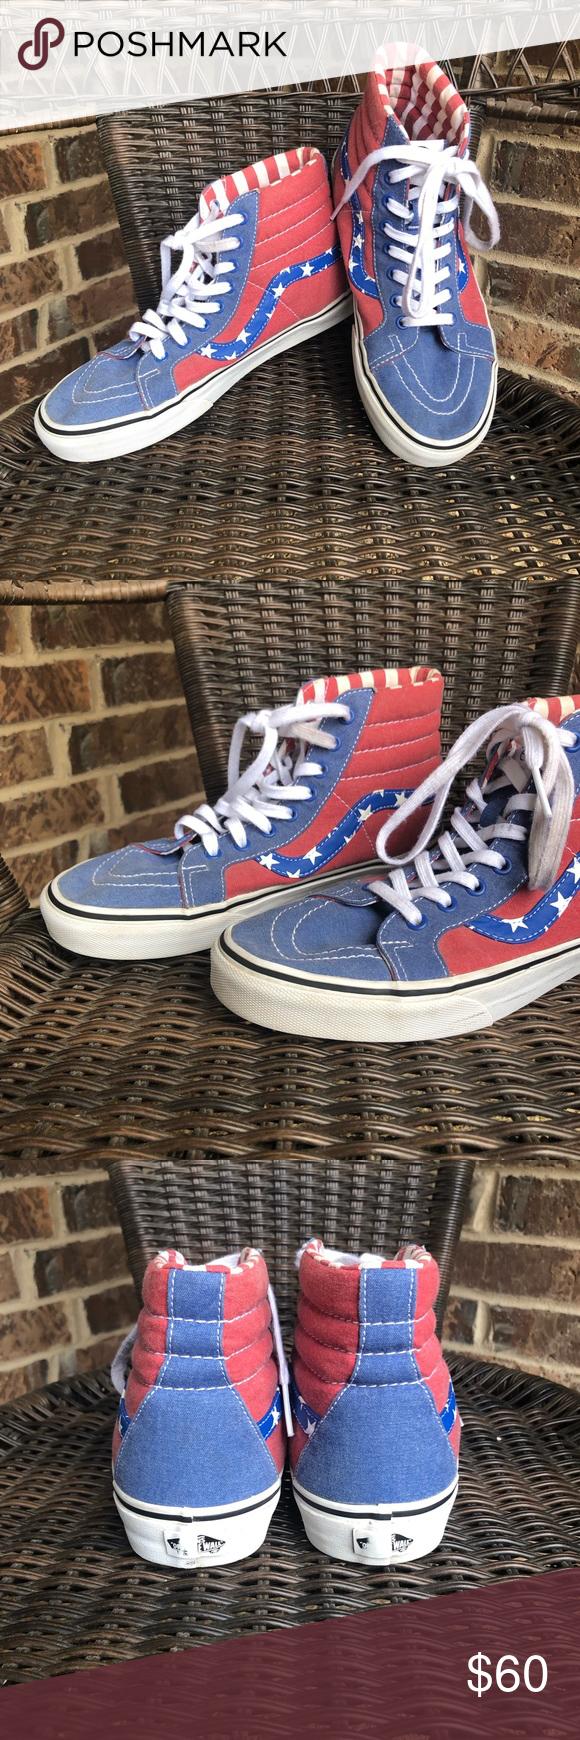 b6e826929bf63d Vans SK8-Hi Reissue Stars and Stripes Canvas Shoes EUC. Light wear ...